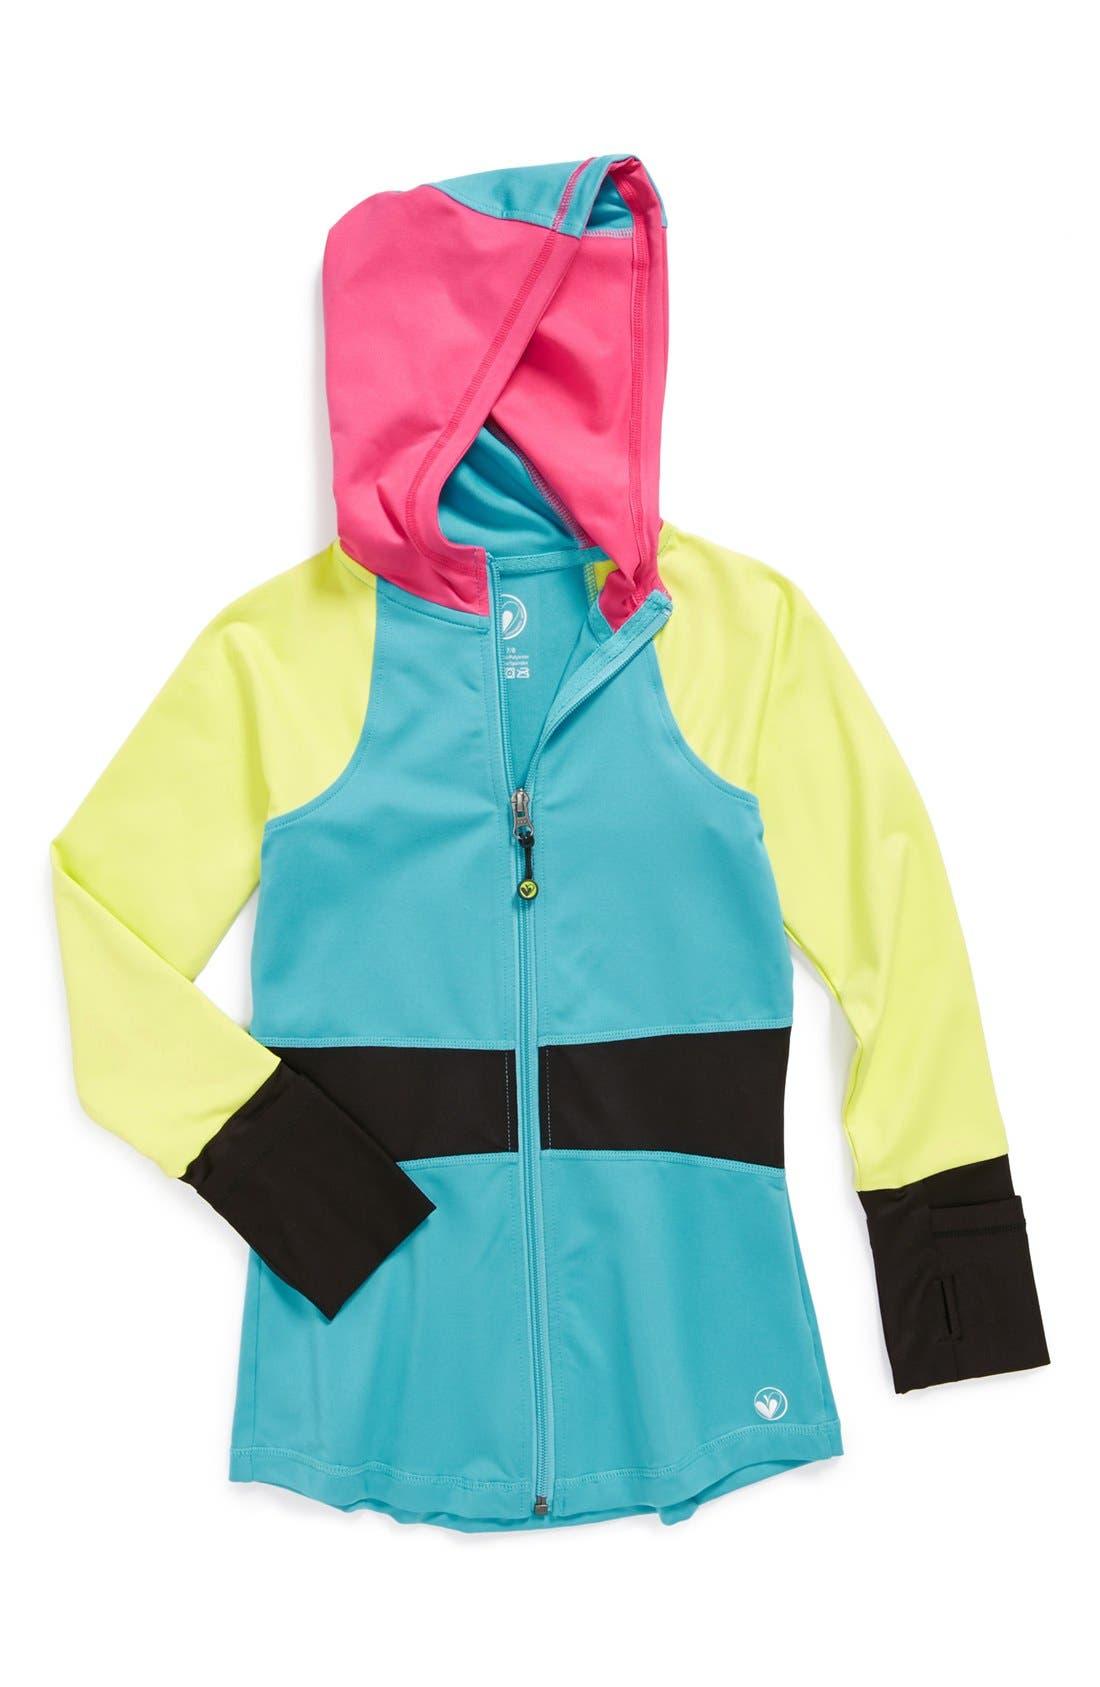 Alternate Image 1 Selected - Limeapple Hooded Jacket (Big Girls)